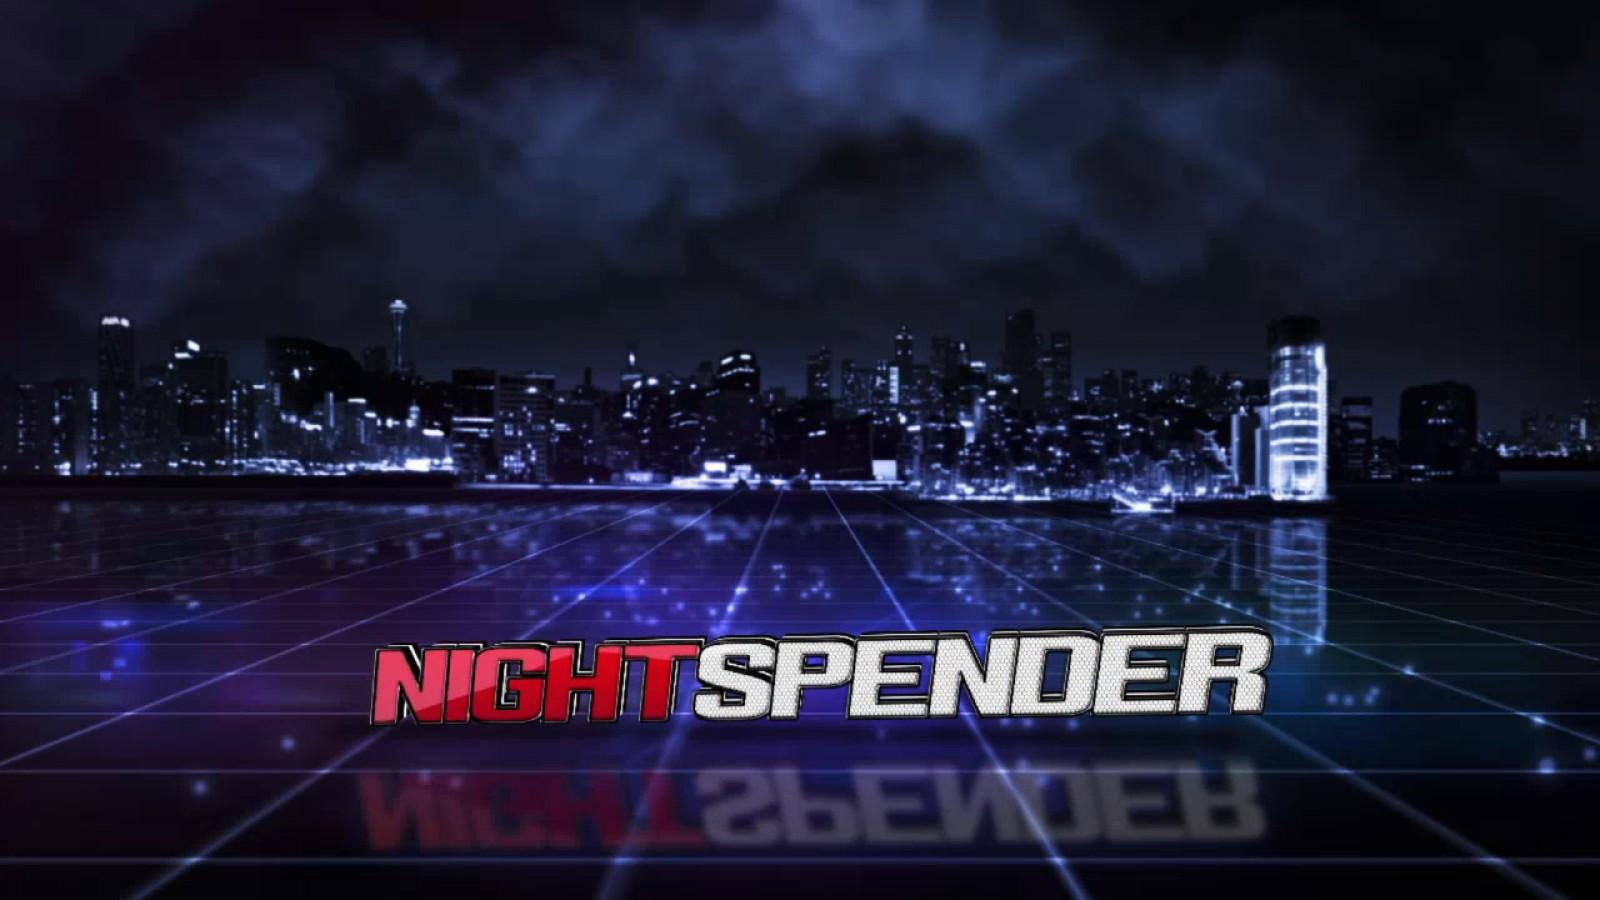 nightspender10